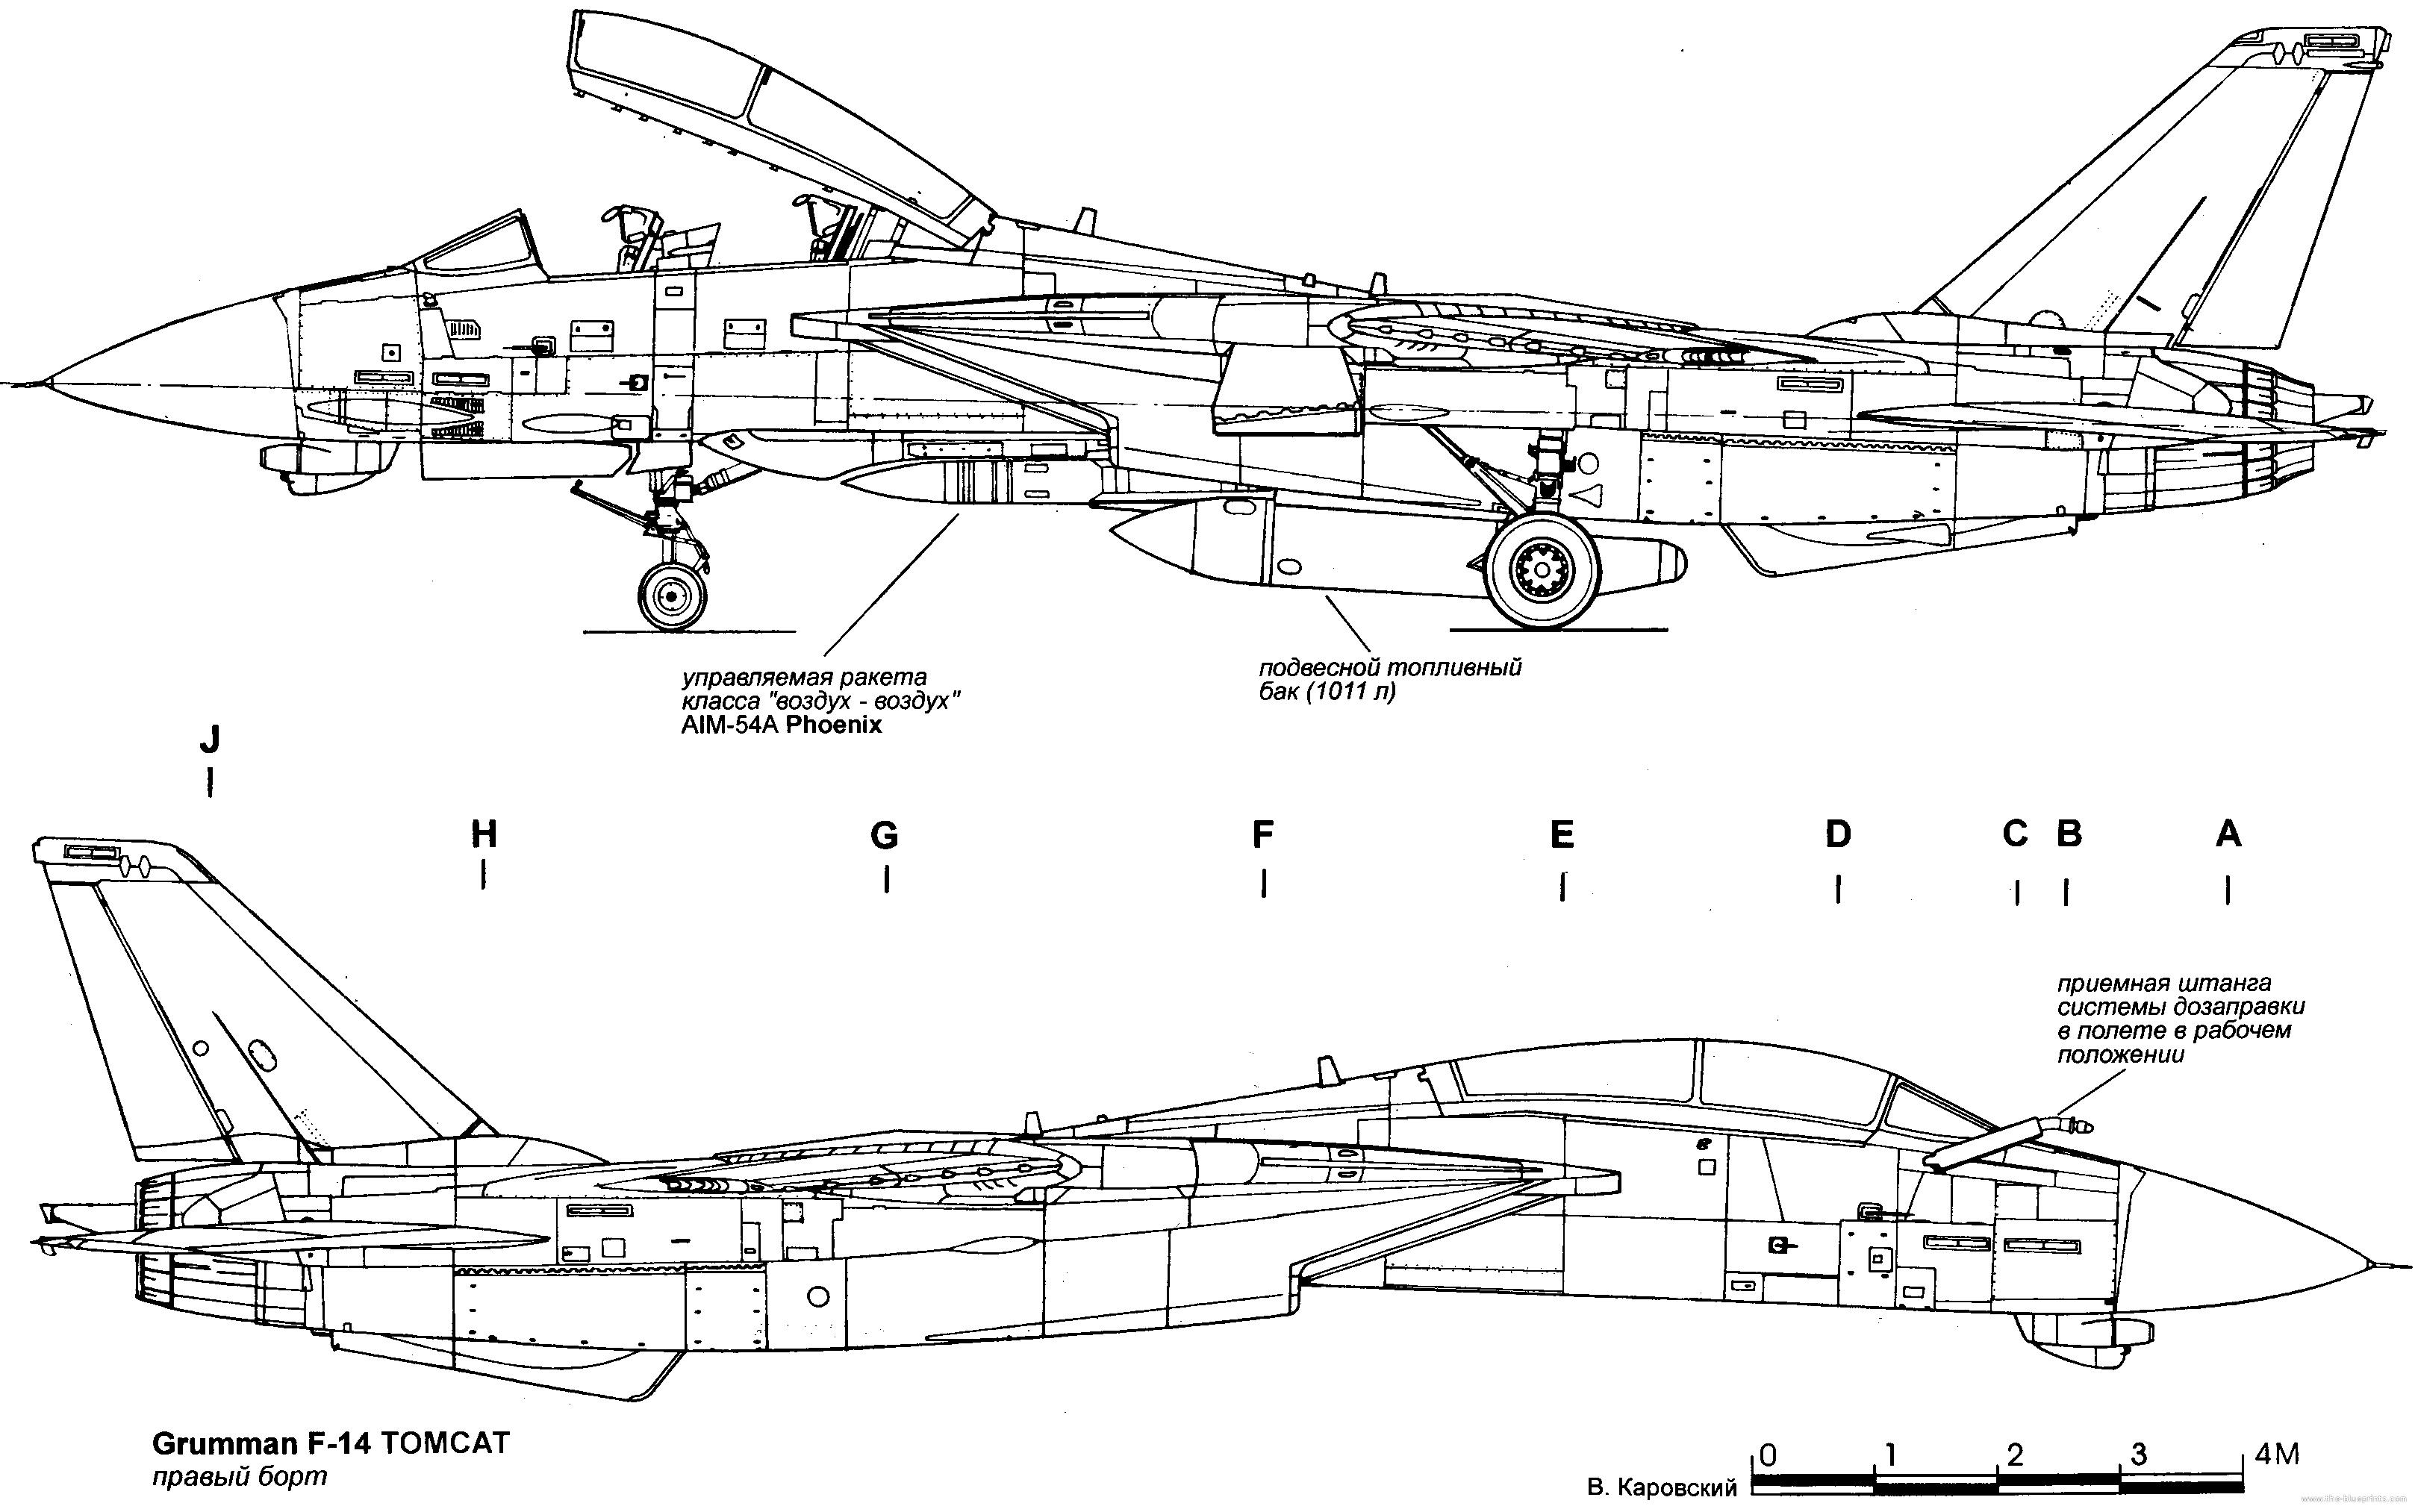 f14 blueprints google search [ 3235 x 2026 Pixel ]